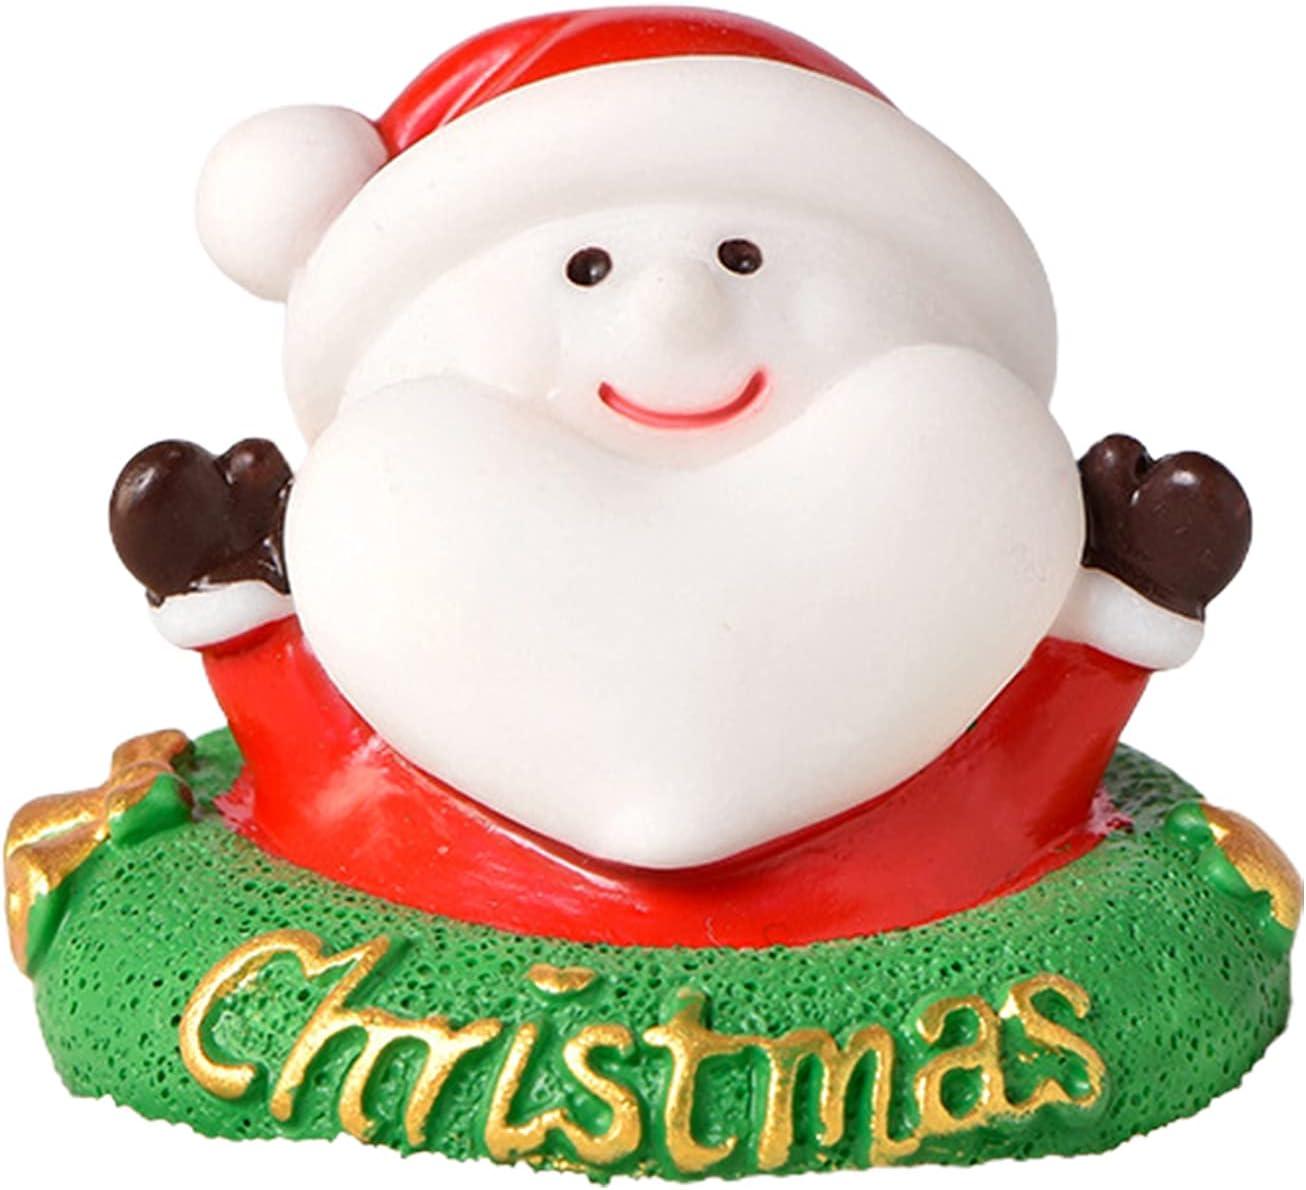 Chicmine Christmas Figurine 5 ☆ very popular Mini Santa Chr free shipping Cartoon Snowman Resin